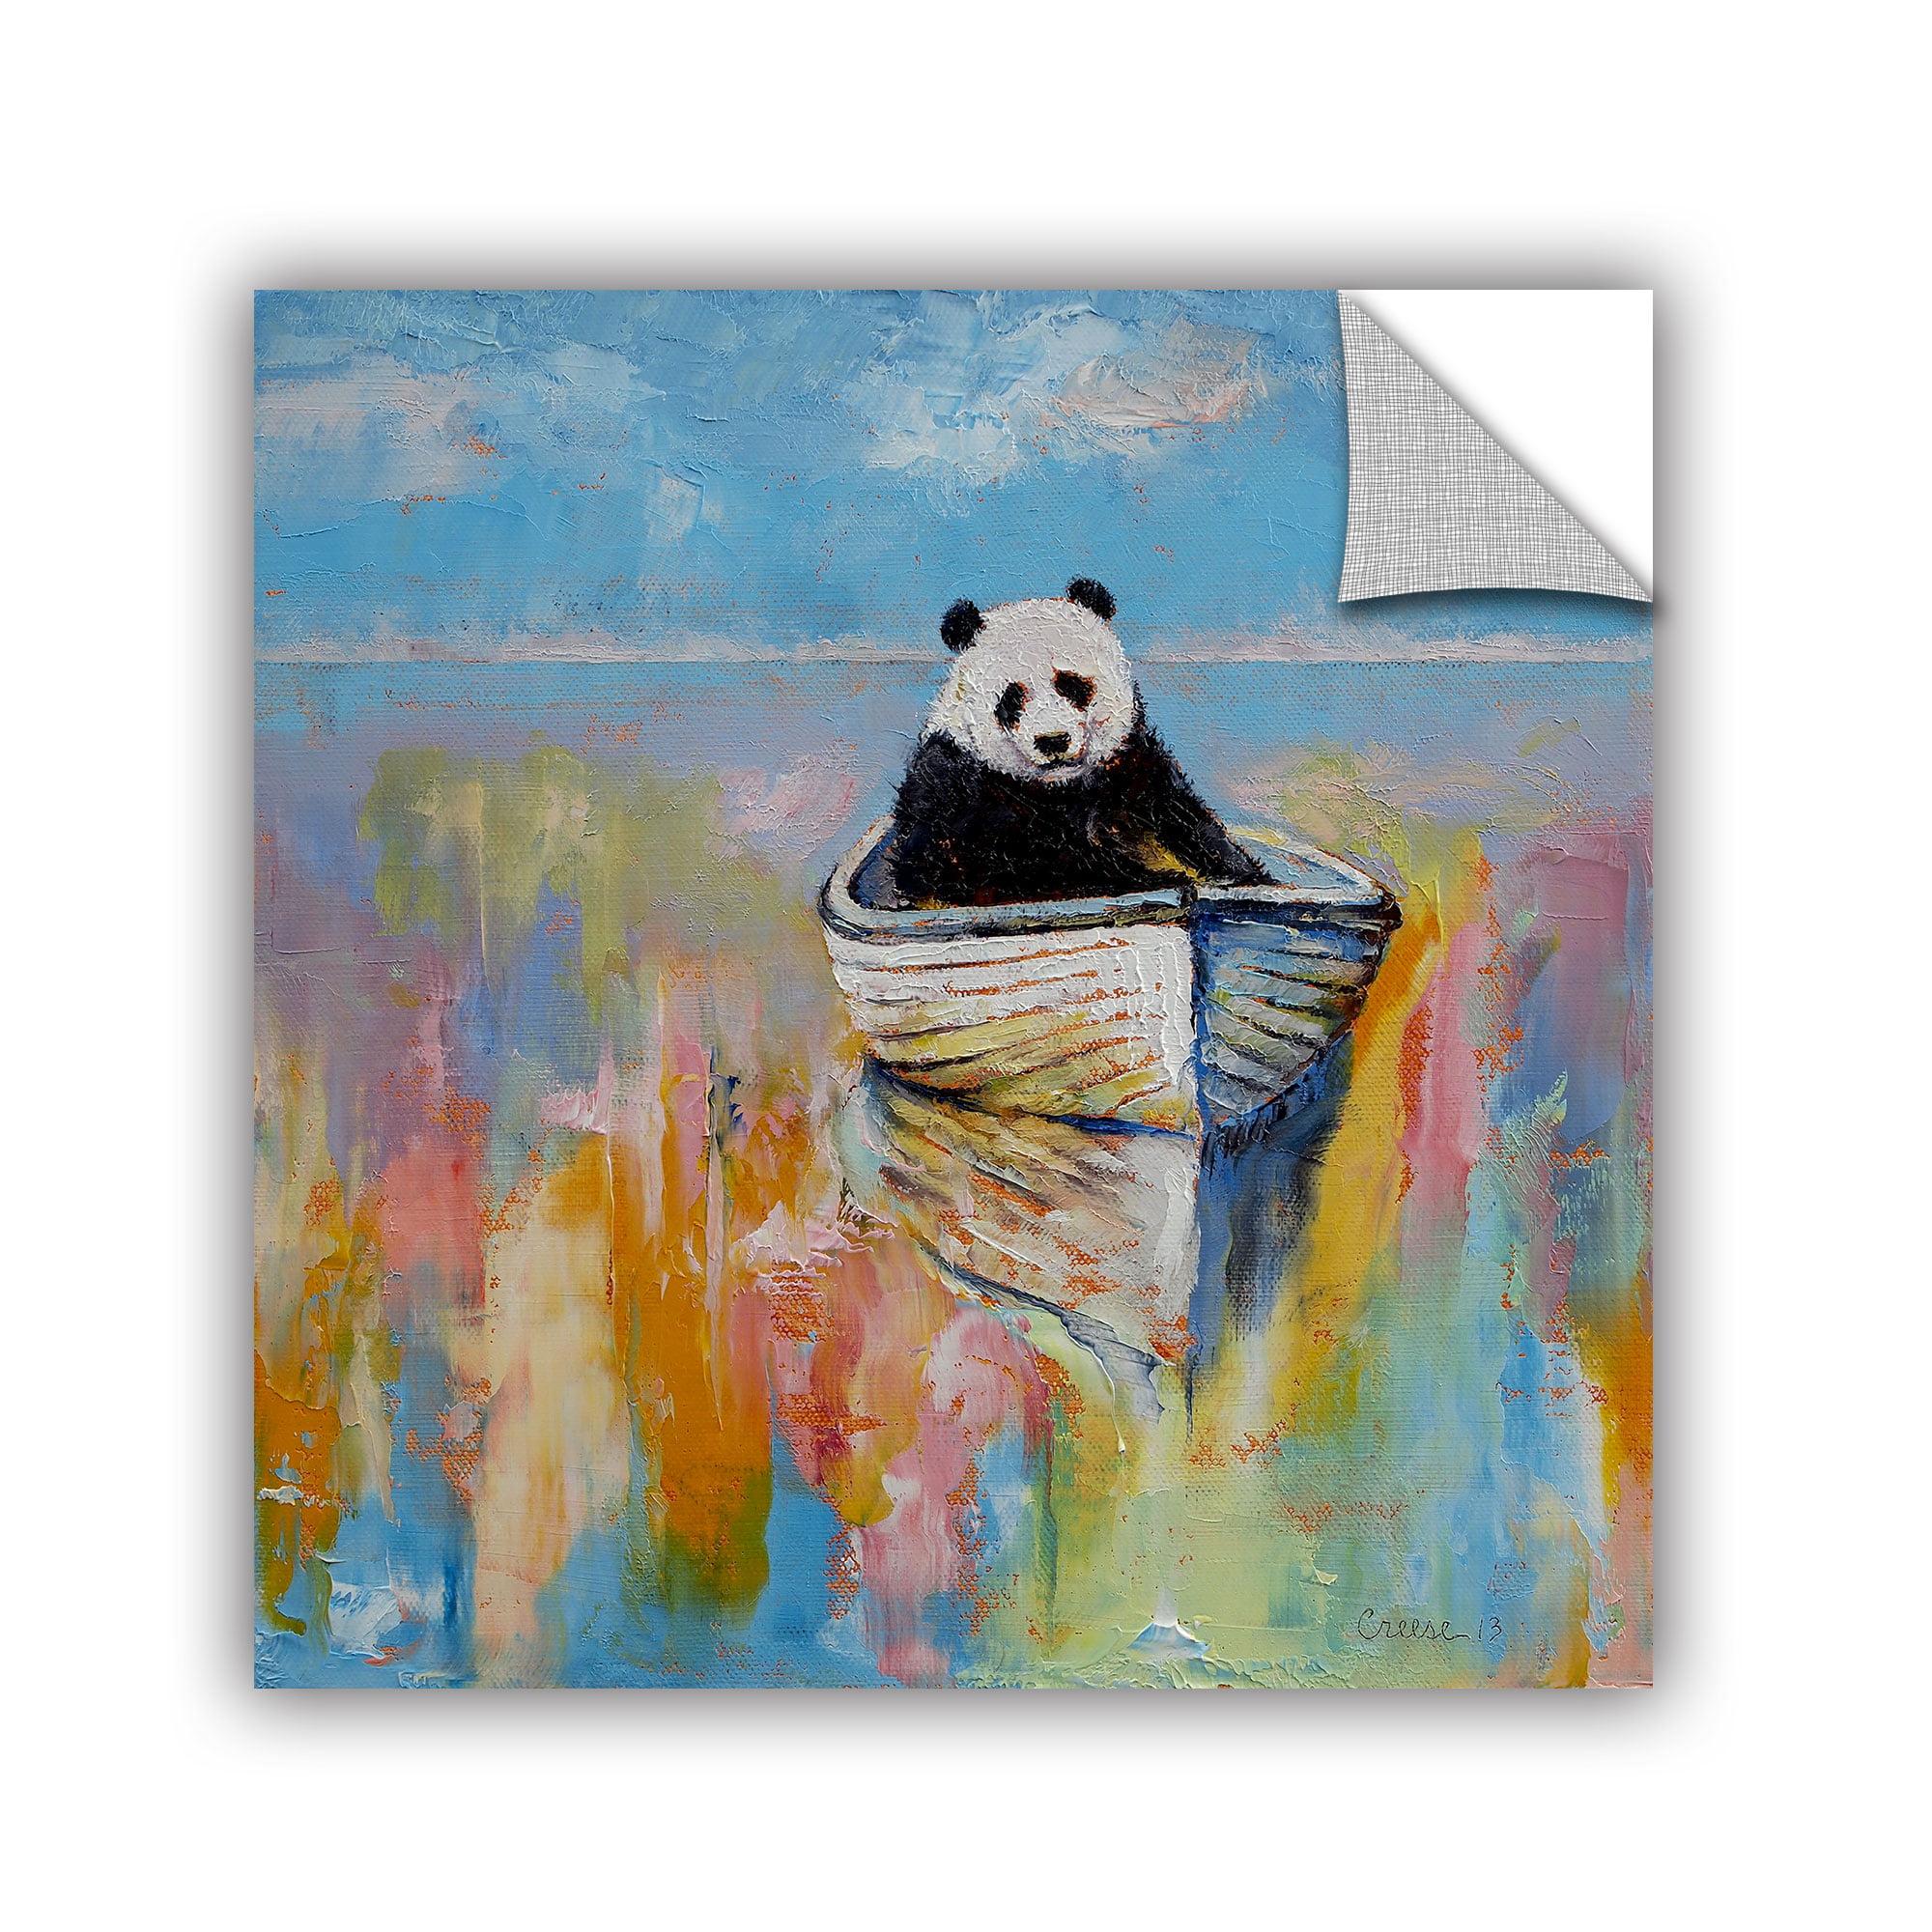 'Panda' Removable Wall Art Mural